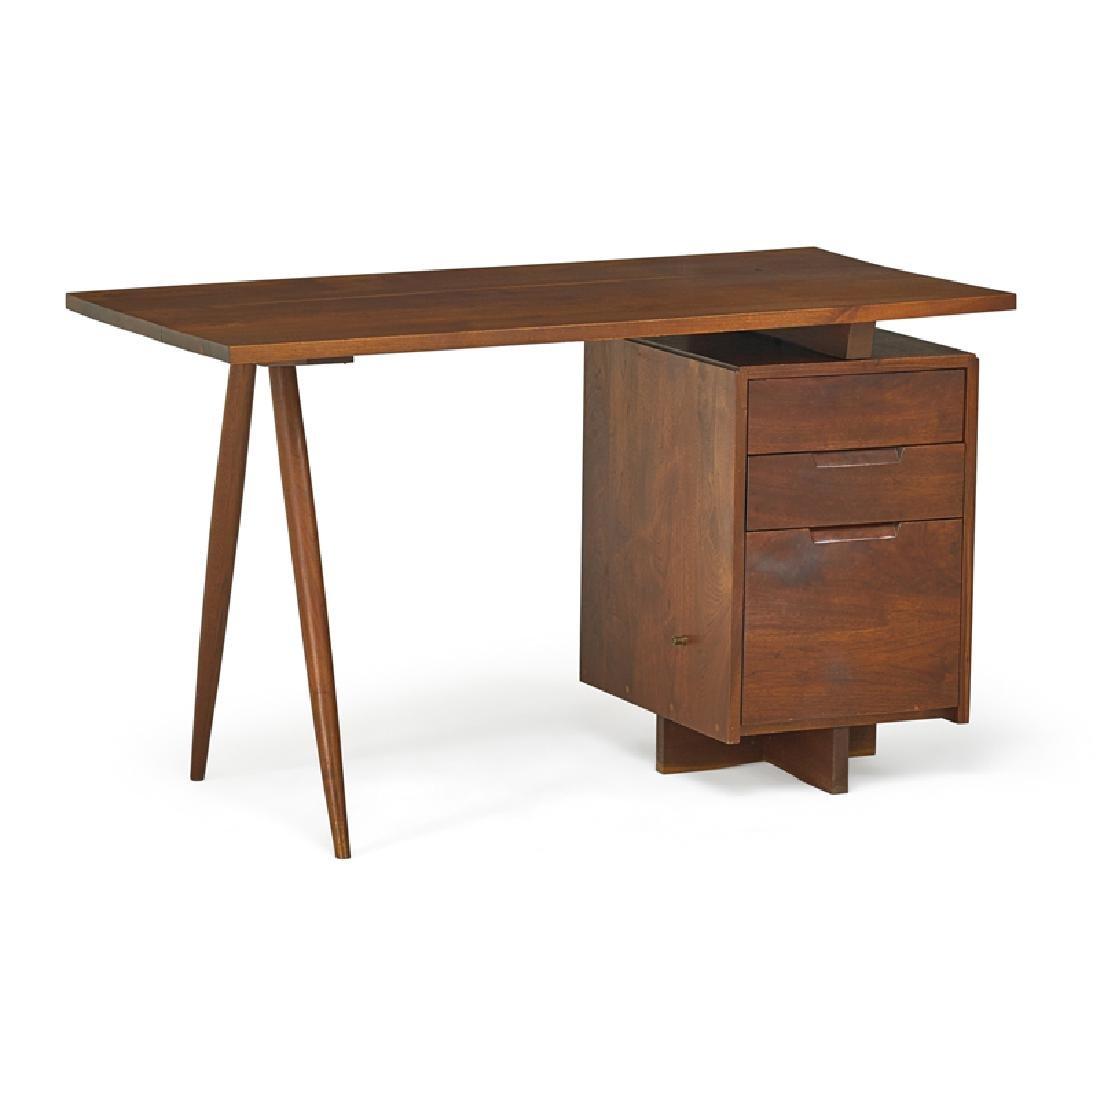 GEORGE NAKASHIMA Early Single Pedestal Desk